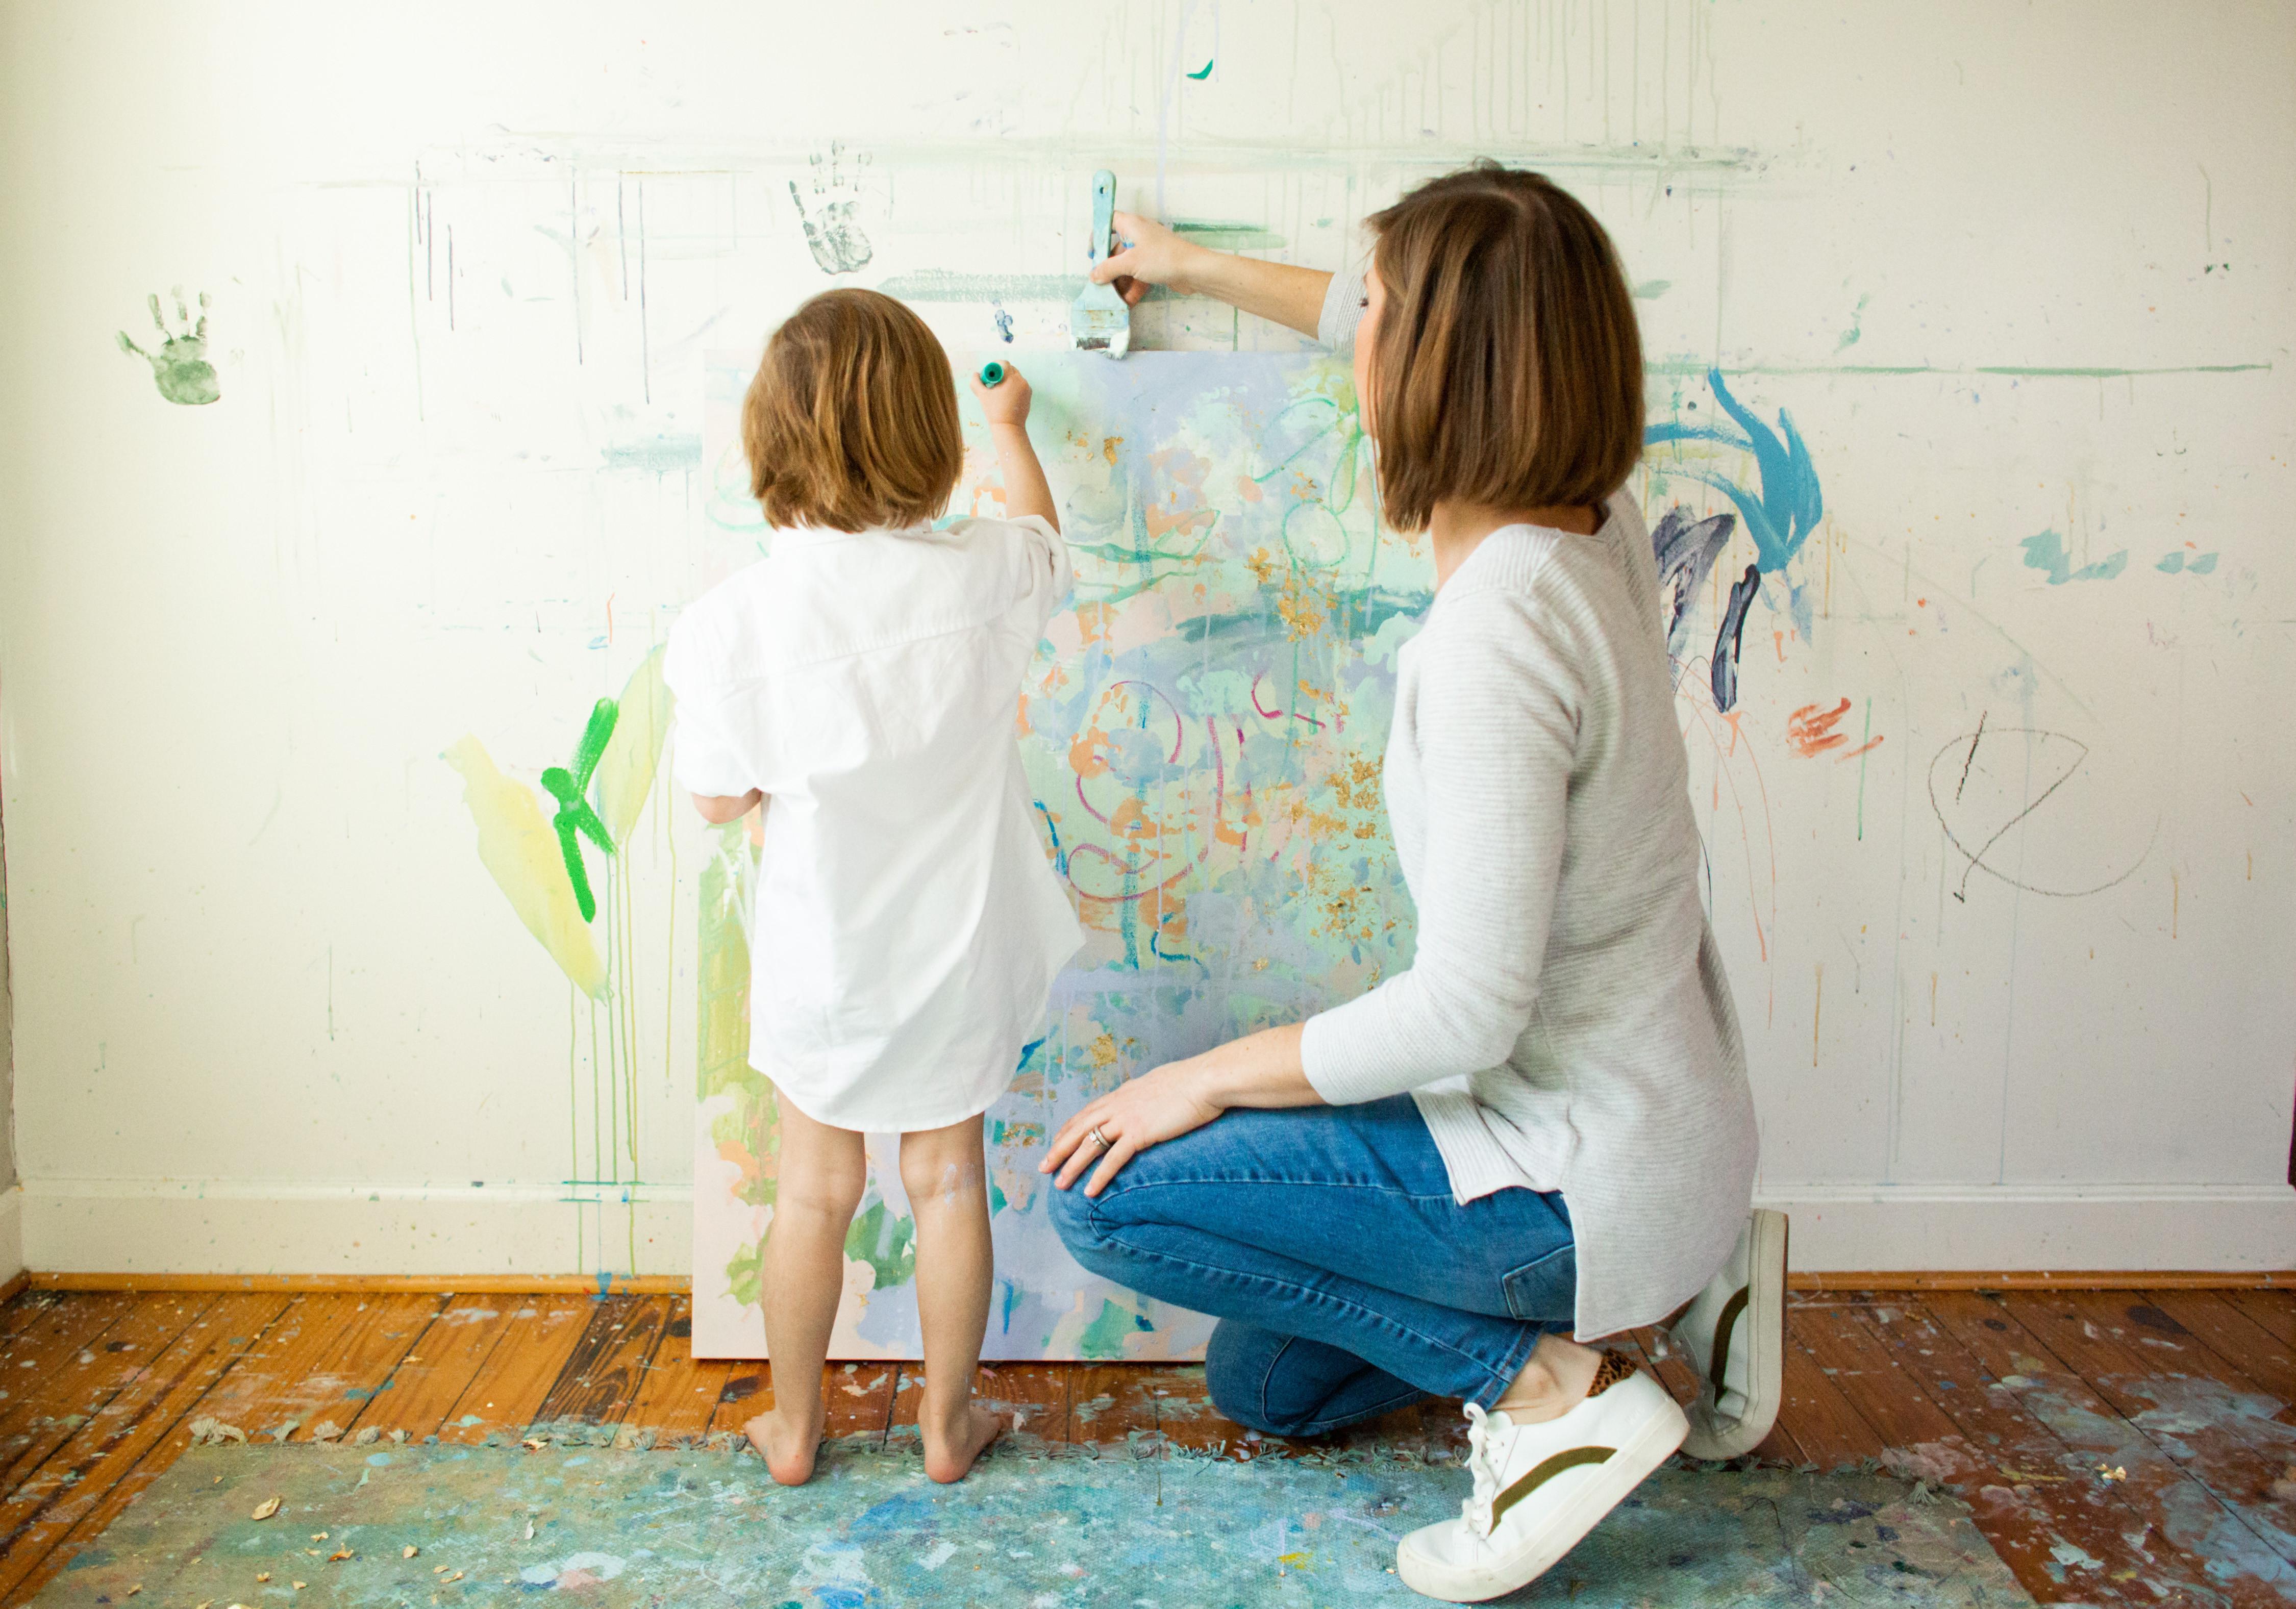 Kid Art Commission: IN STUDIO